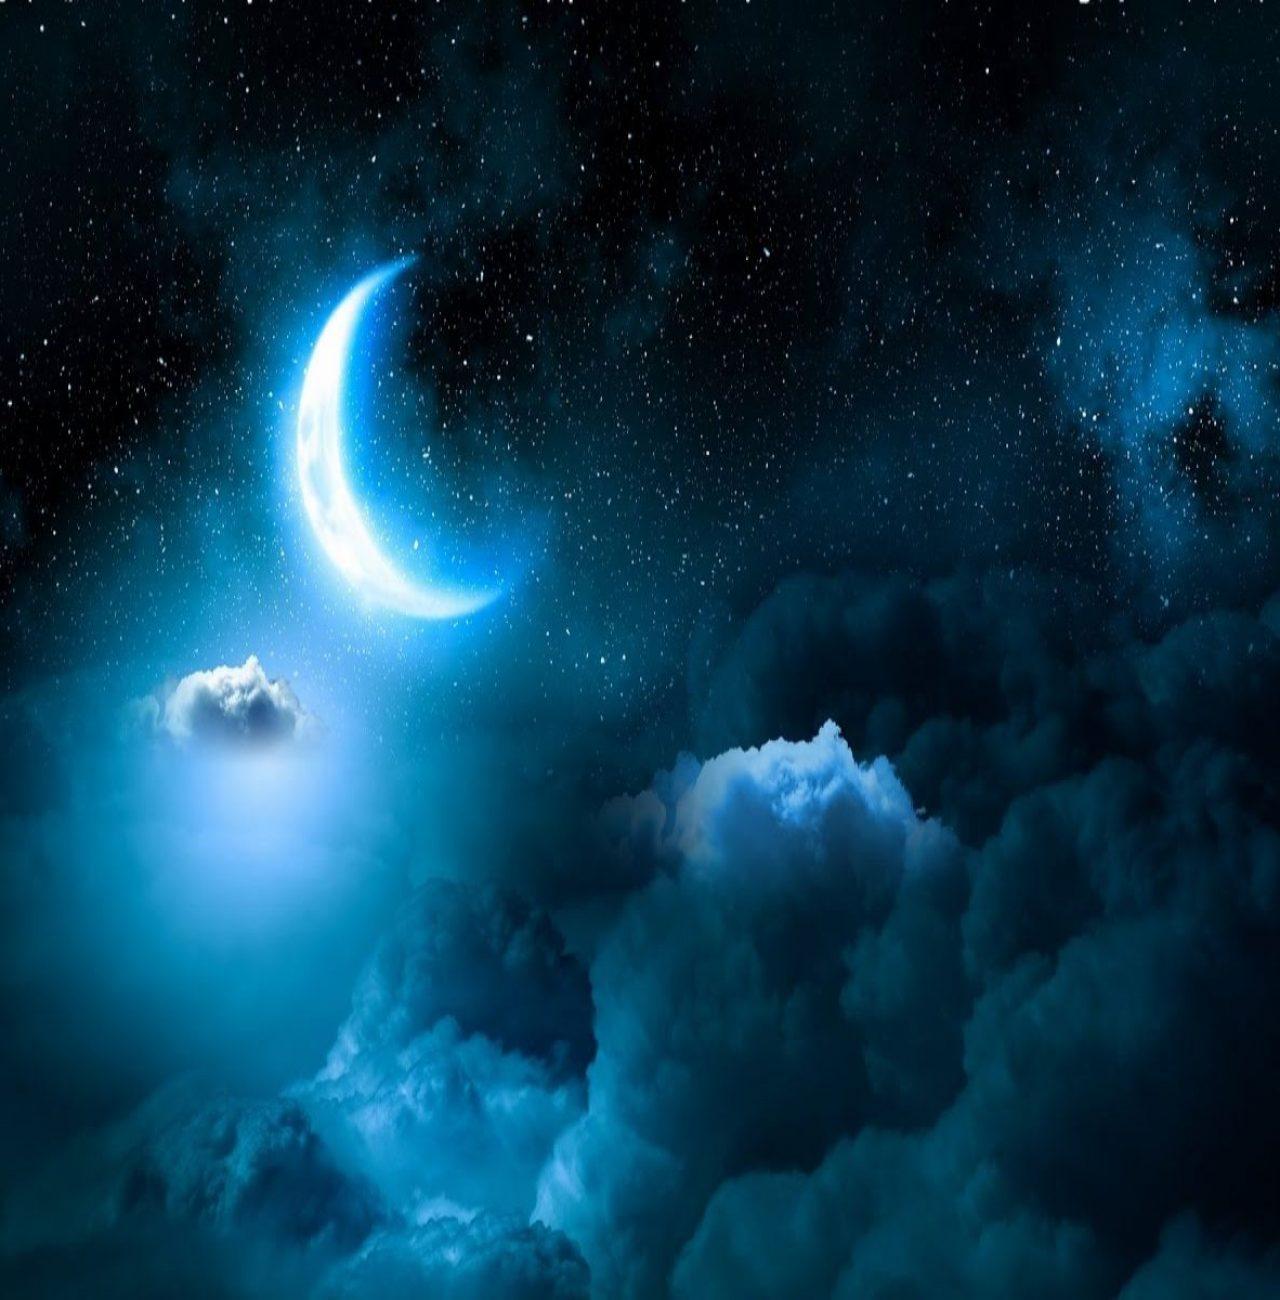 moon and NITE